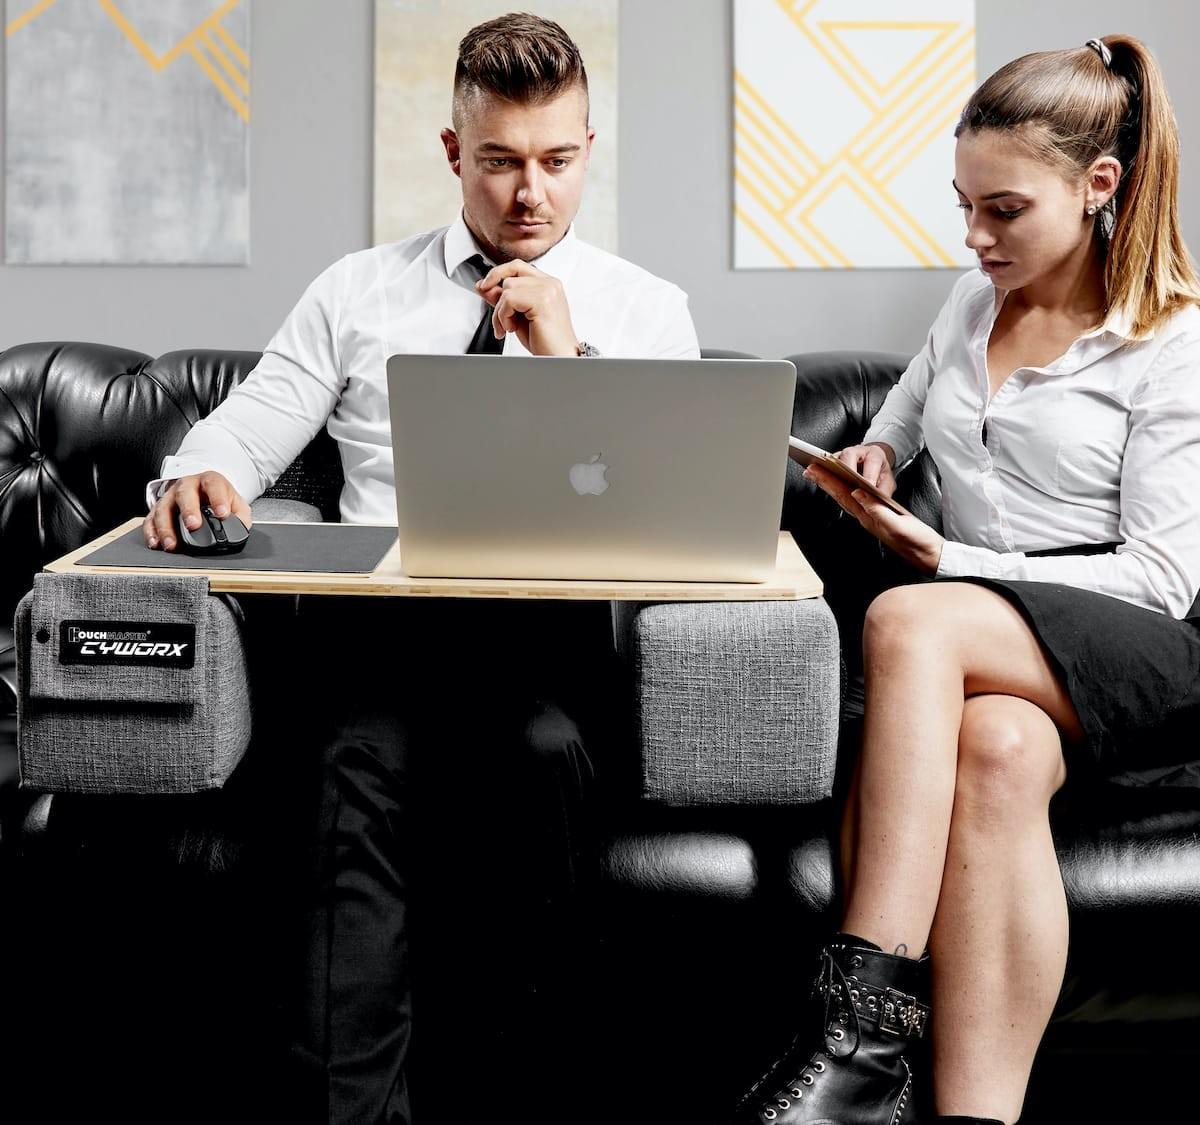 Couchmaster® CYWORX ergonomic lapboard has supportive cushions & better balance